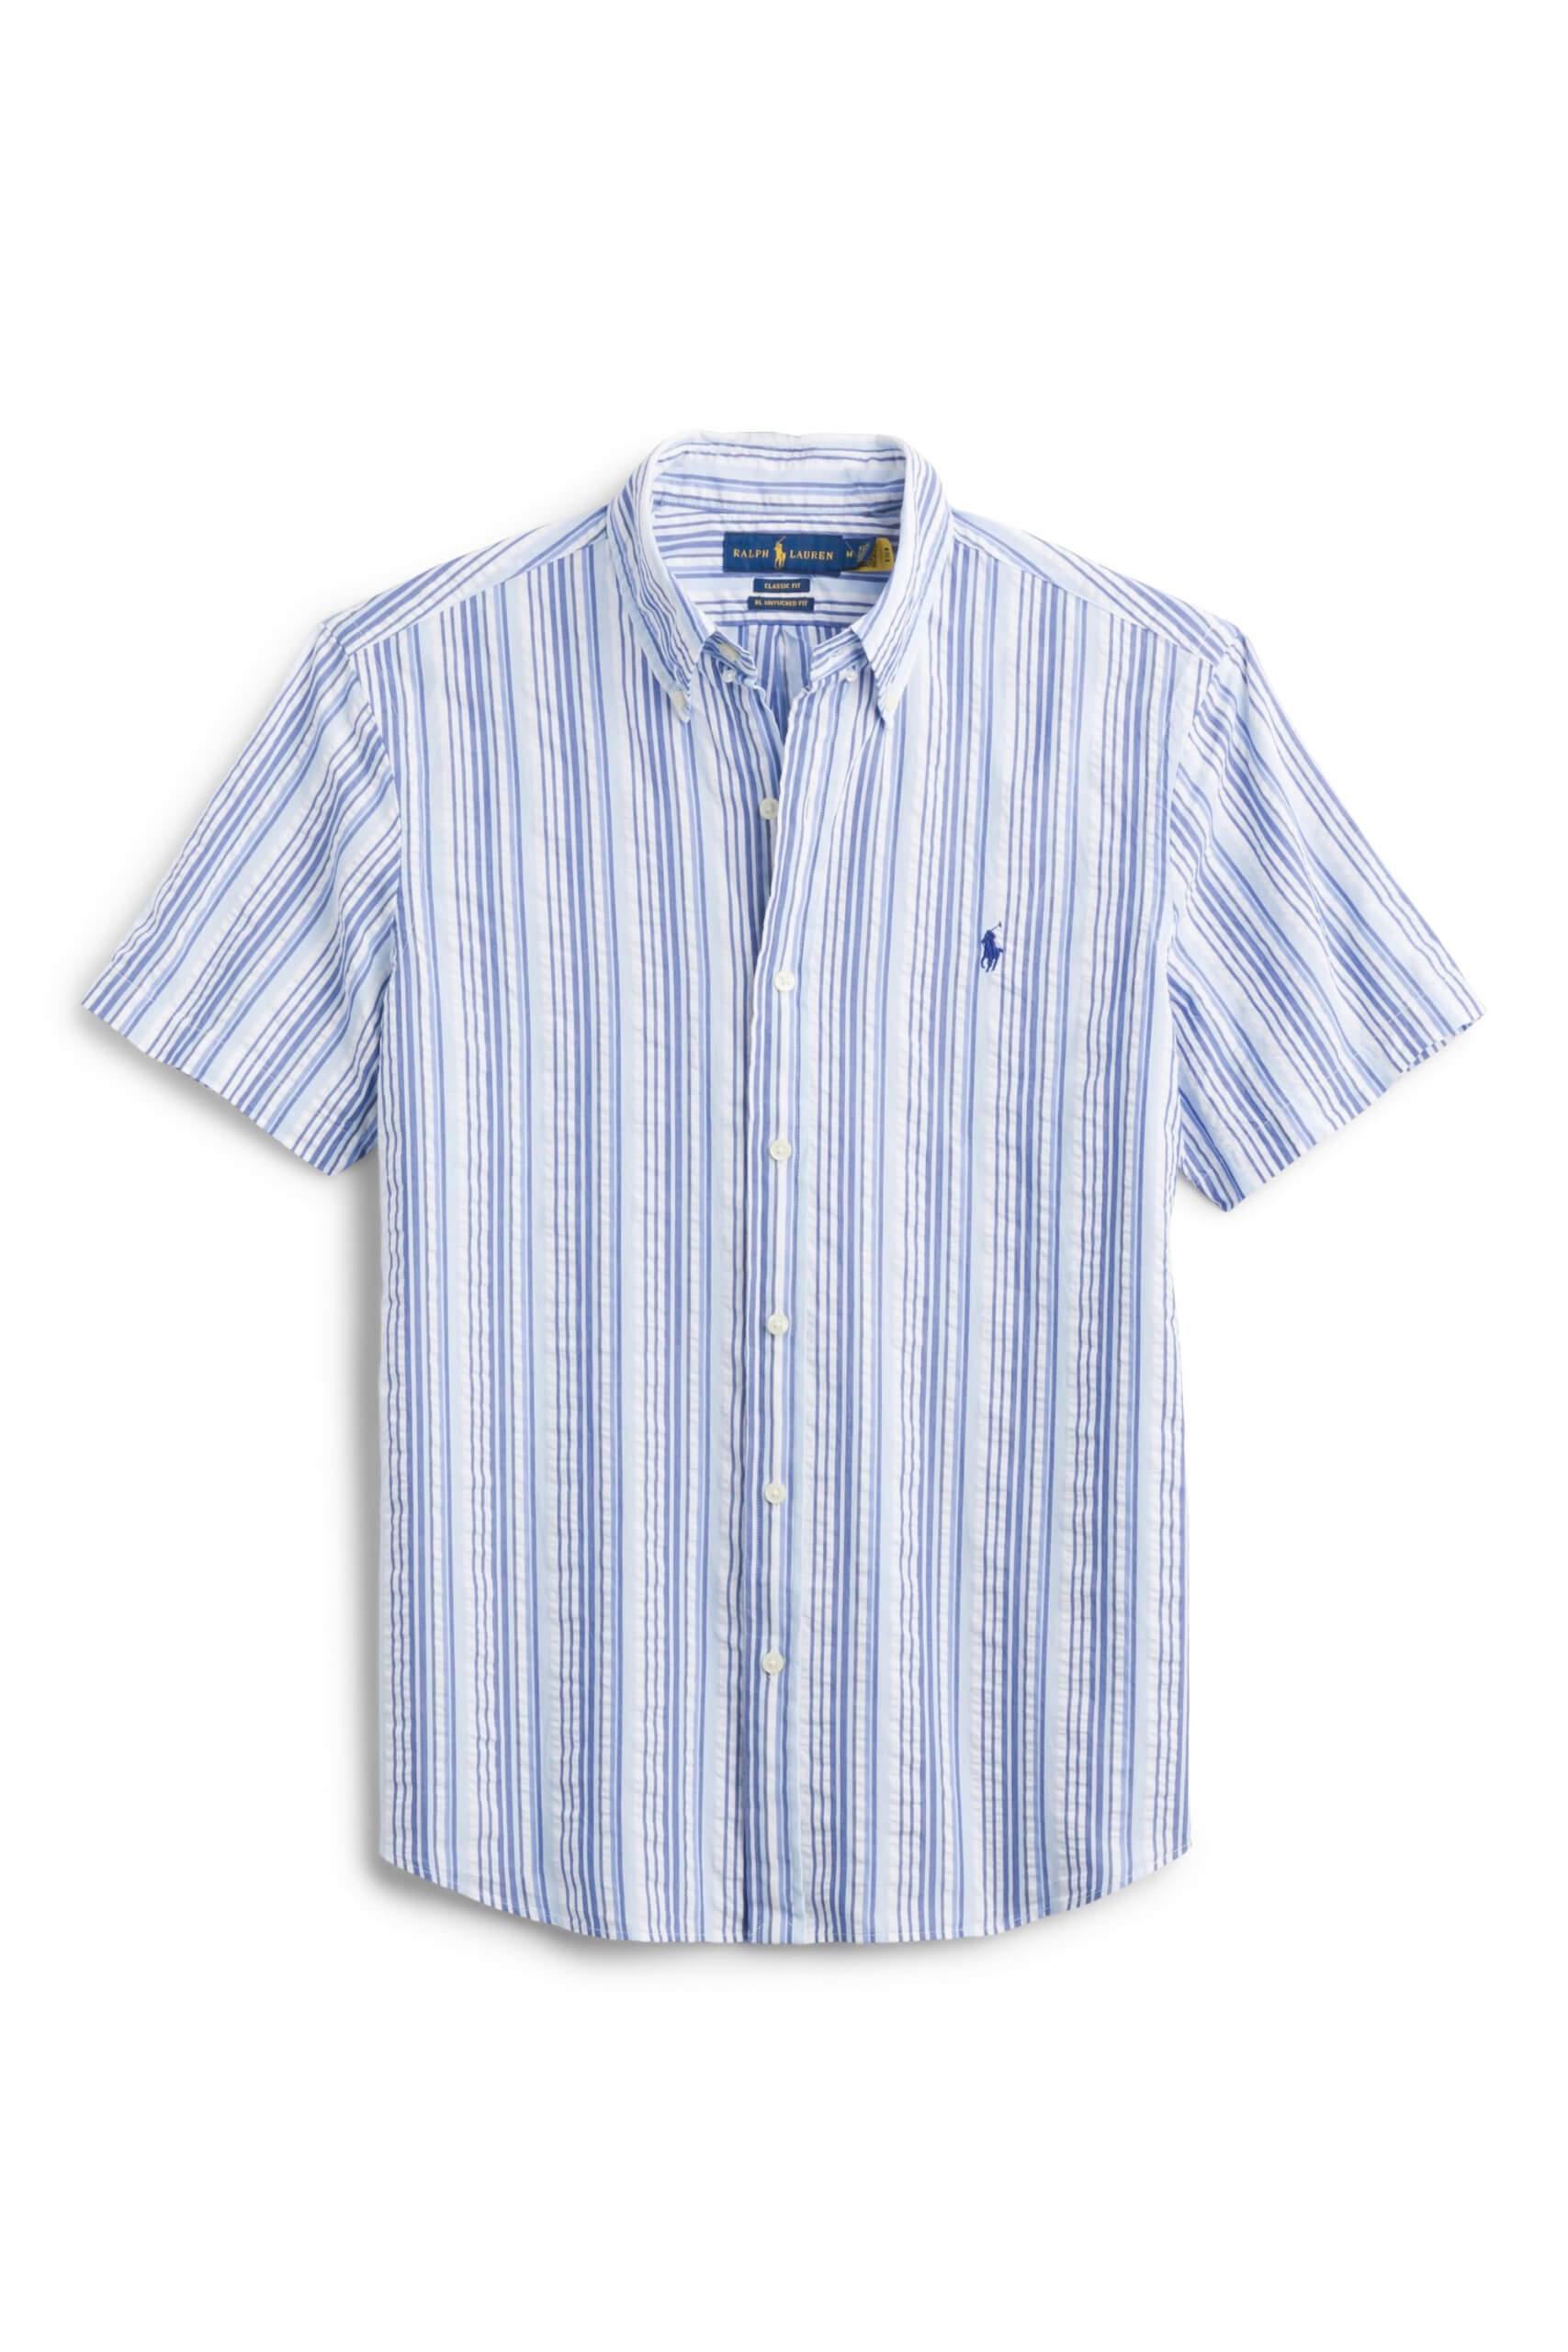 Stitch Fix Men's blue and white striped short sleeve button-down shirt.